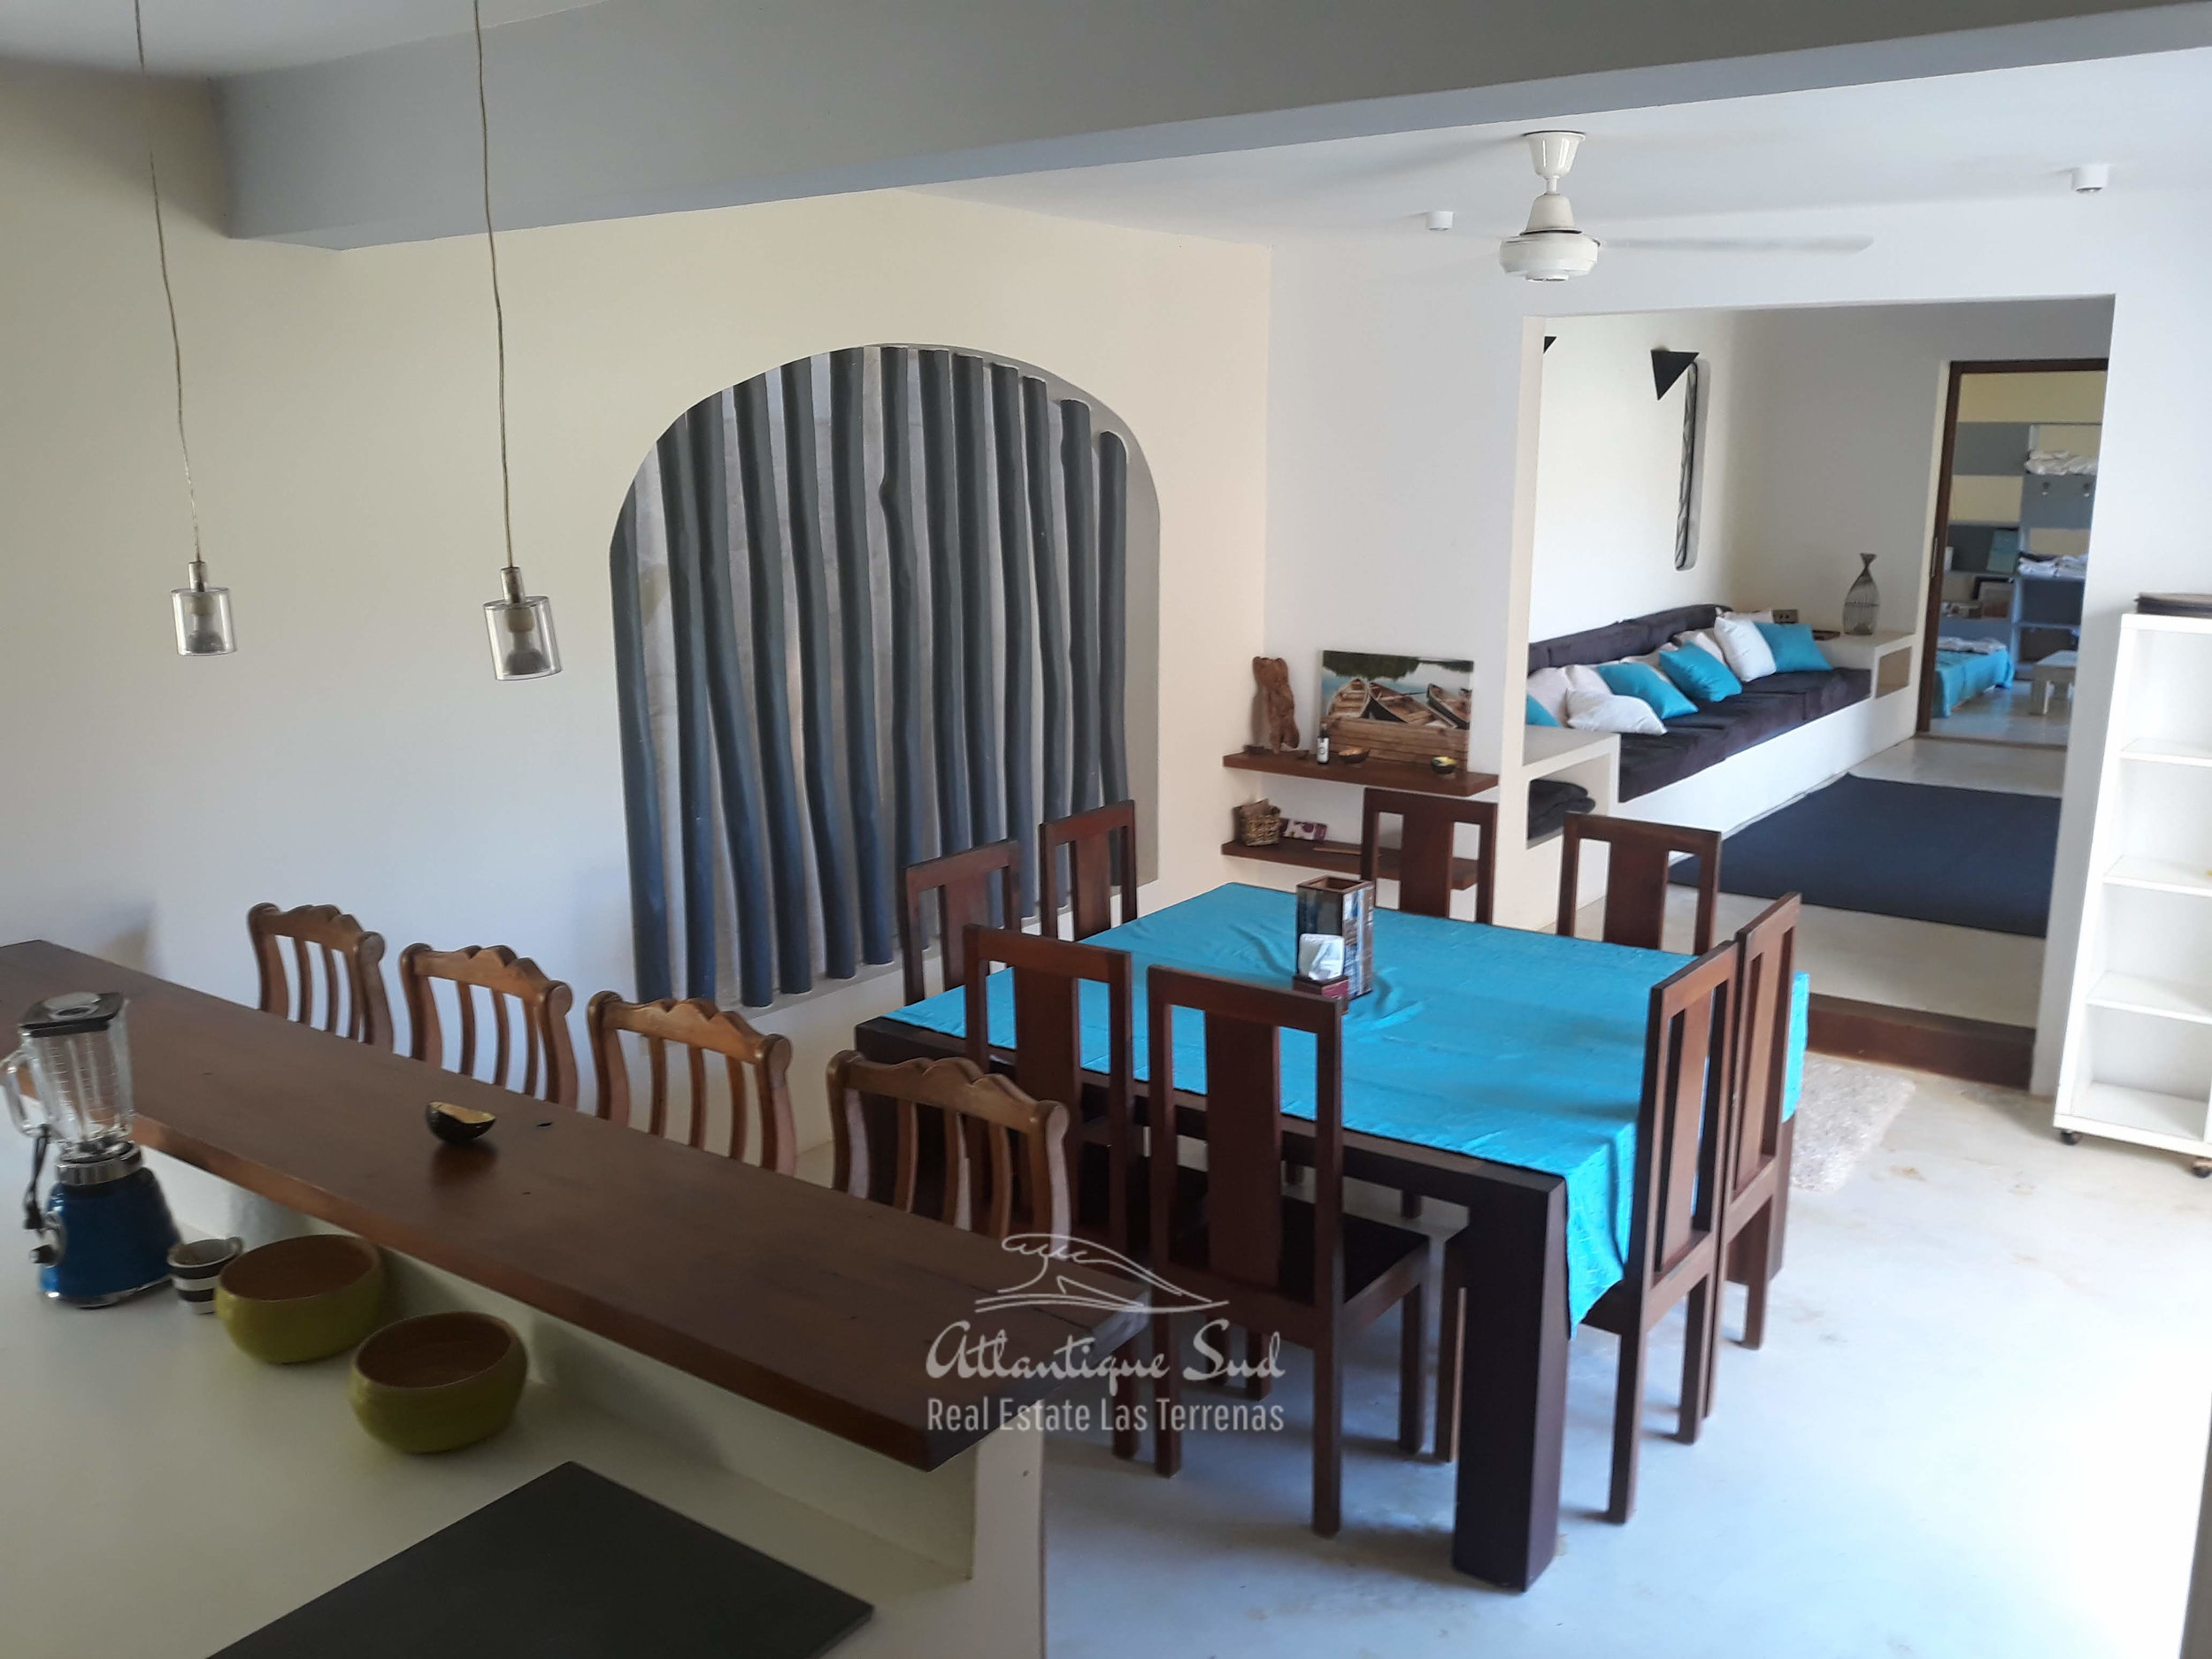 Authentic Caribbean Villa in quiet community in Real Estate Las Terrenas Atlantique Sud16.jpg